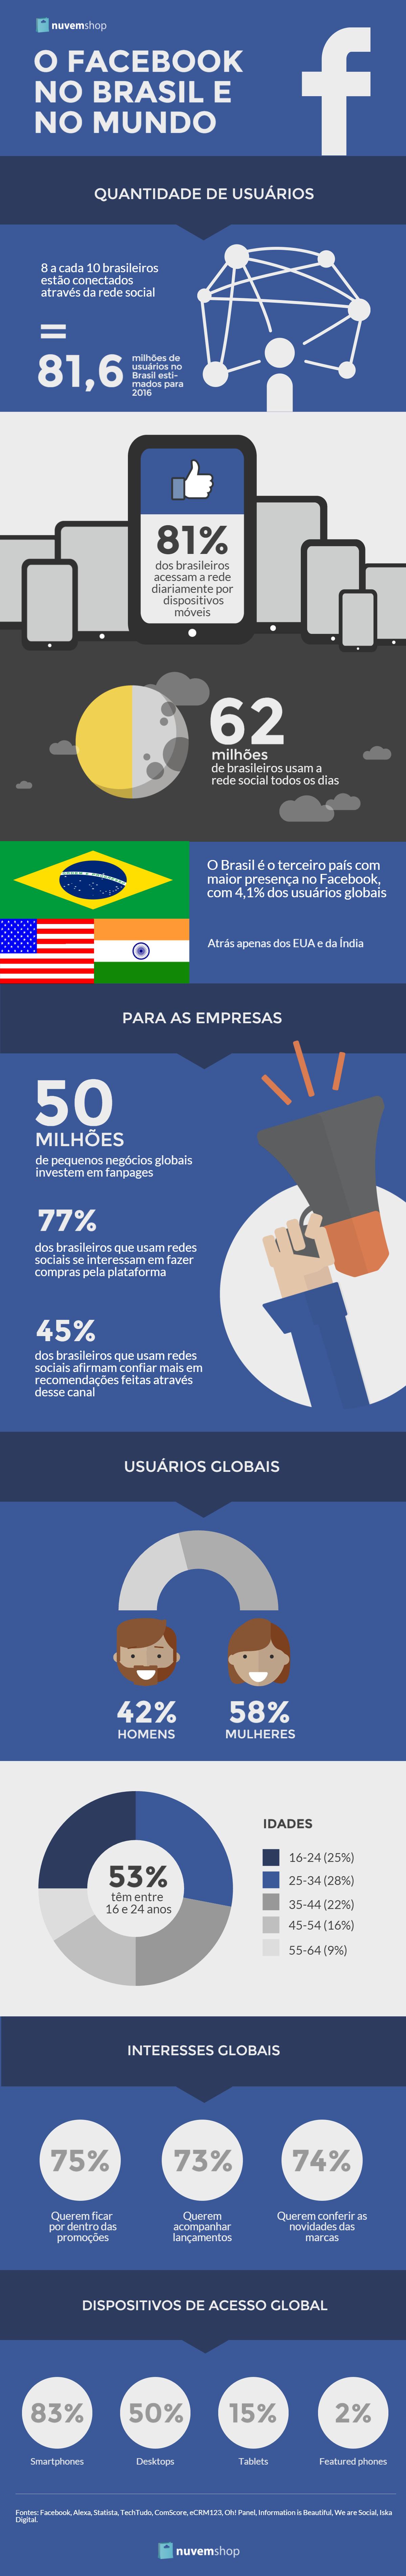 Infográfico O Facebook no Brasil e no mundo